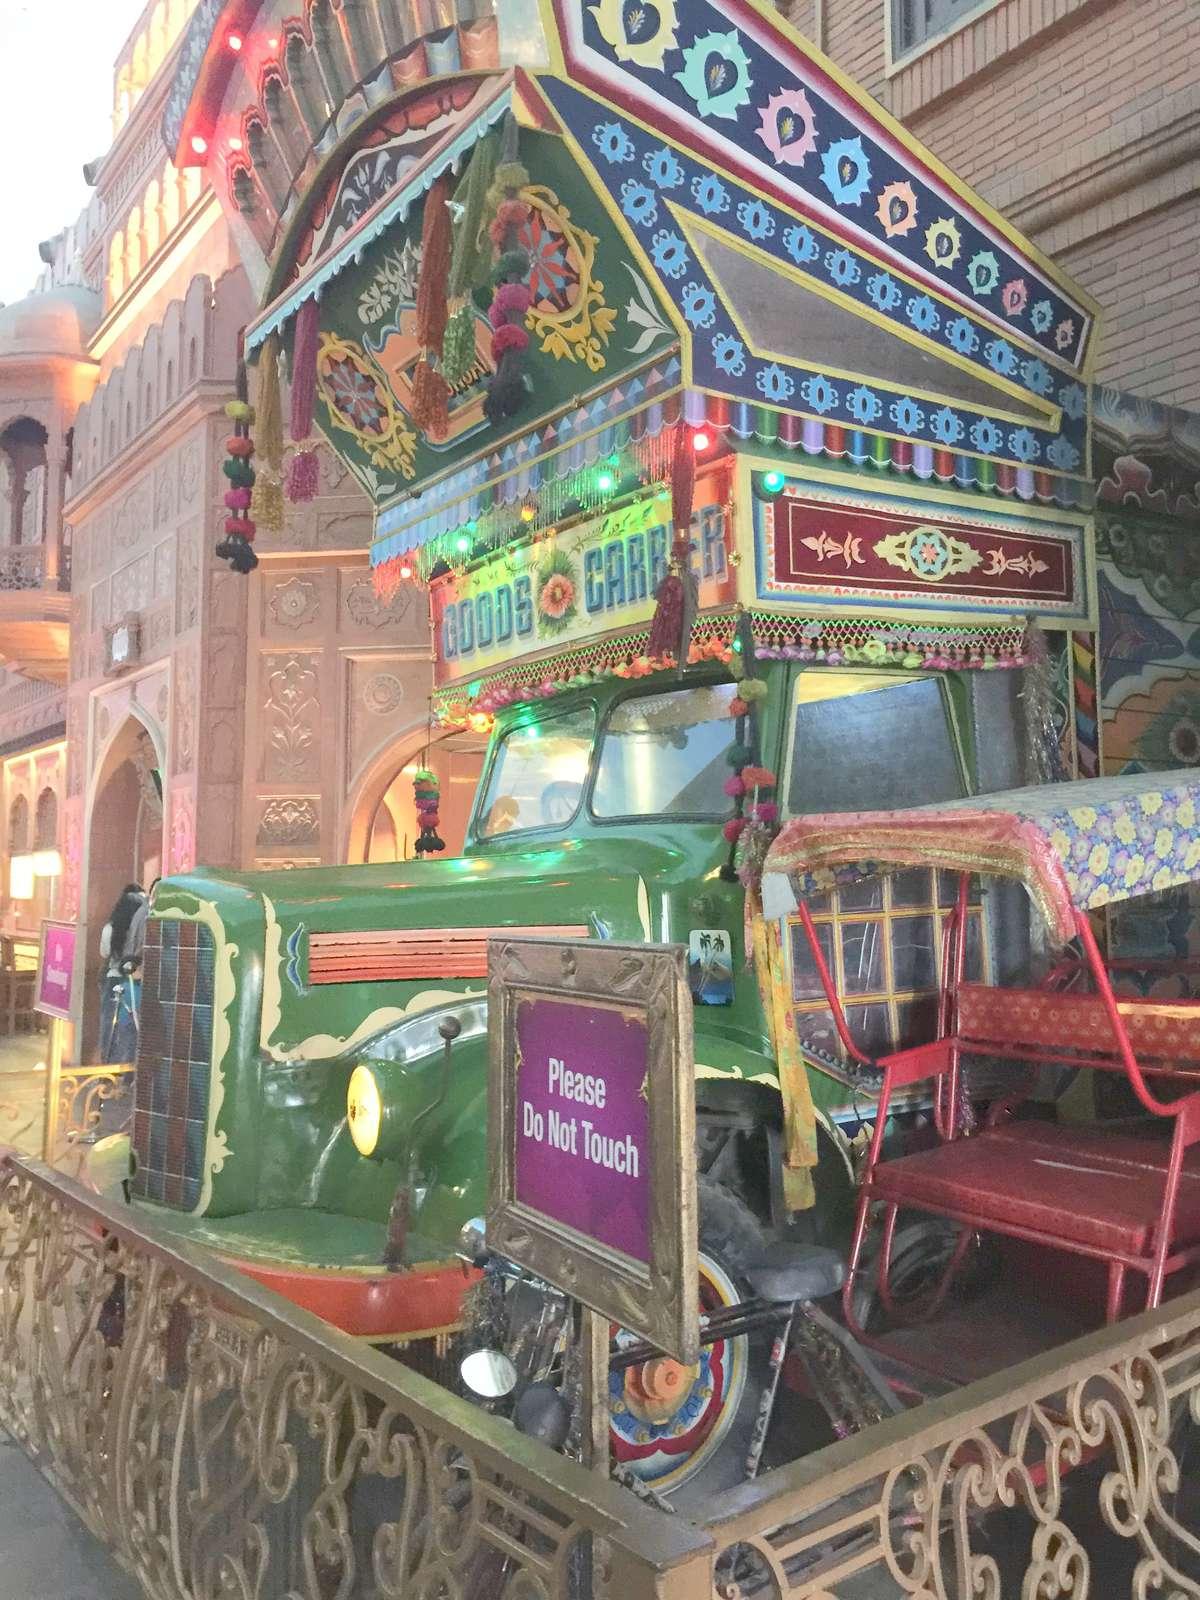 Punjab Kingdom Of Dreams, Sector 29 - Gurgaon Image